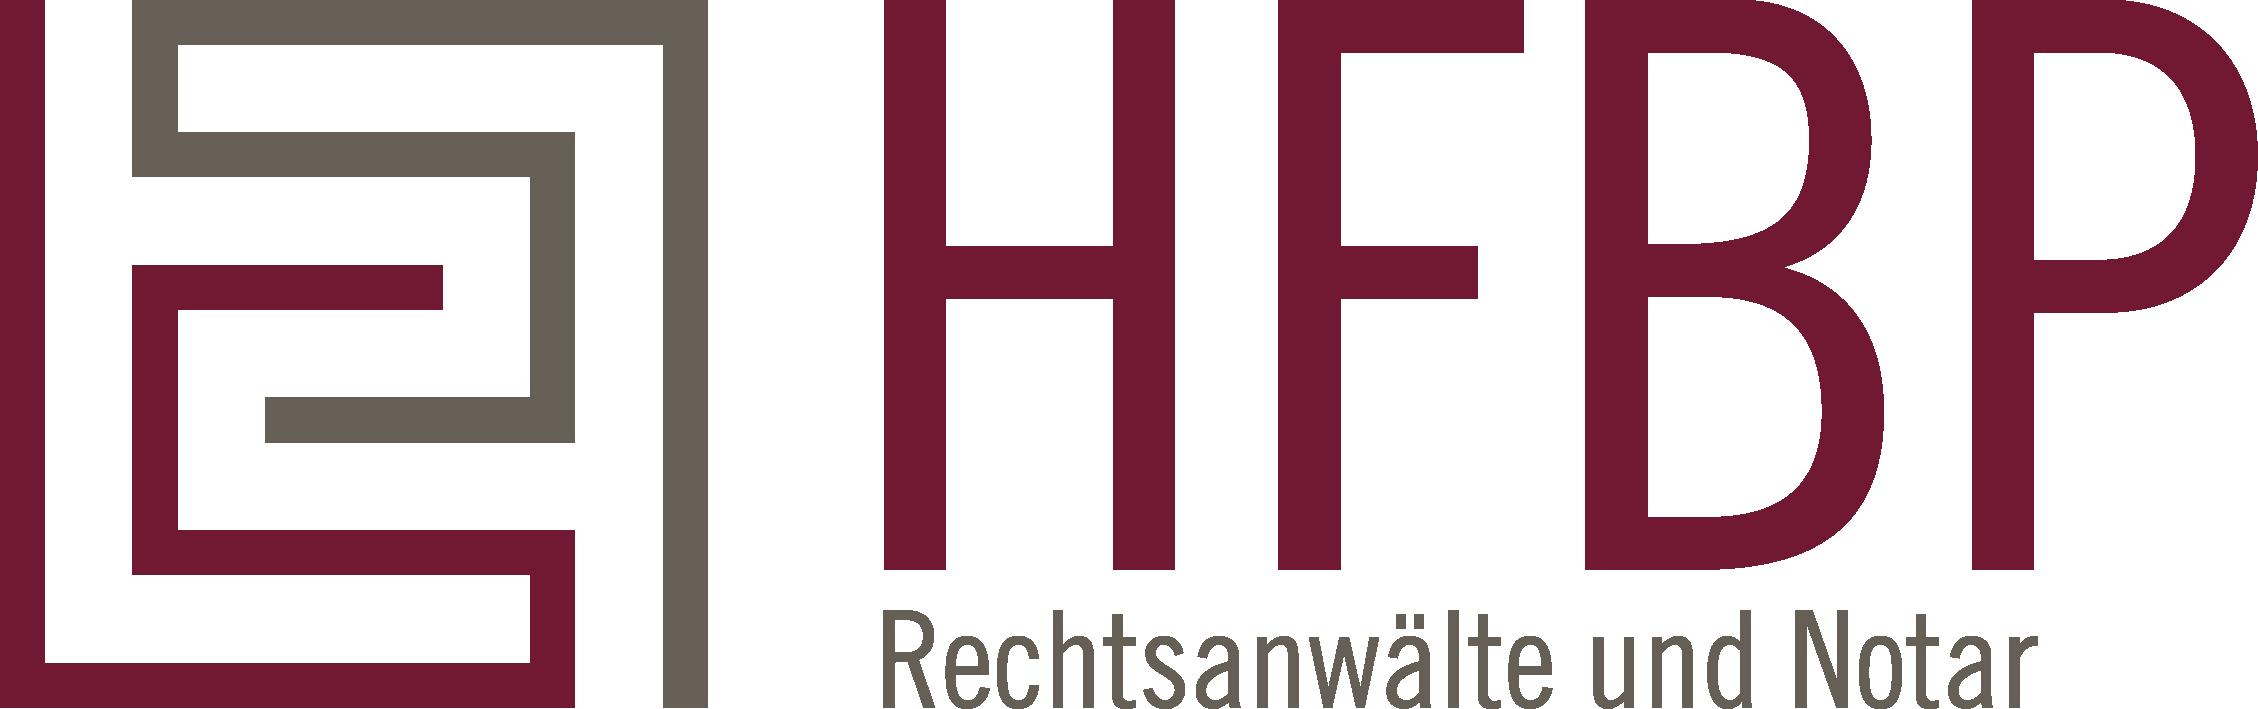 HFBP_Logo_RGB_300dpi